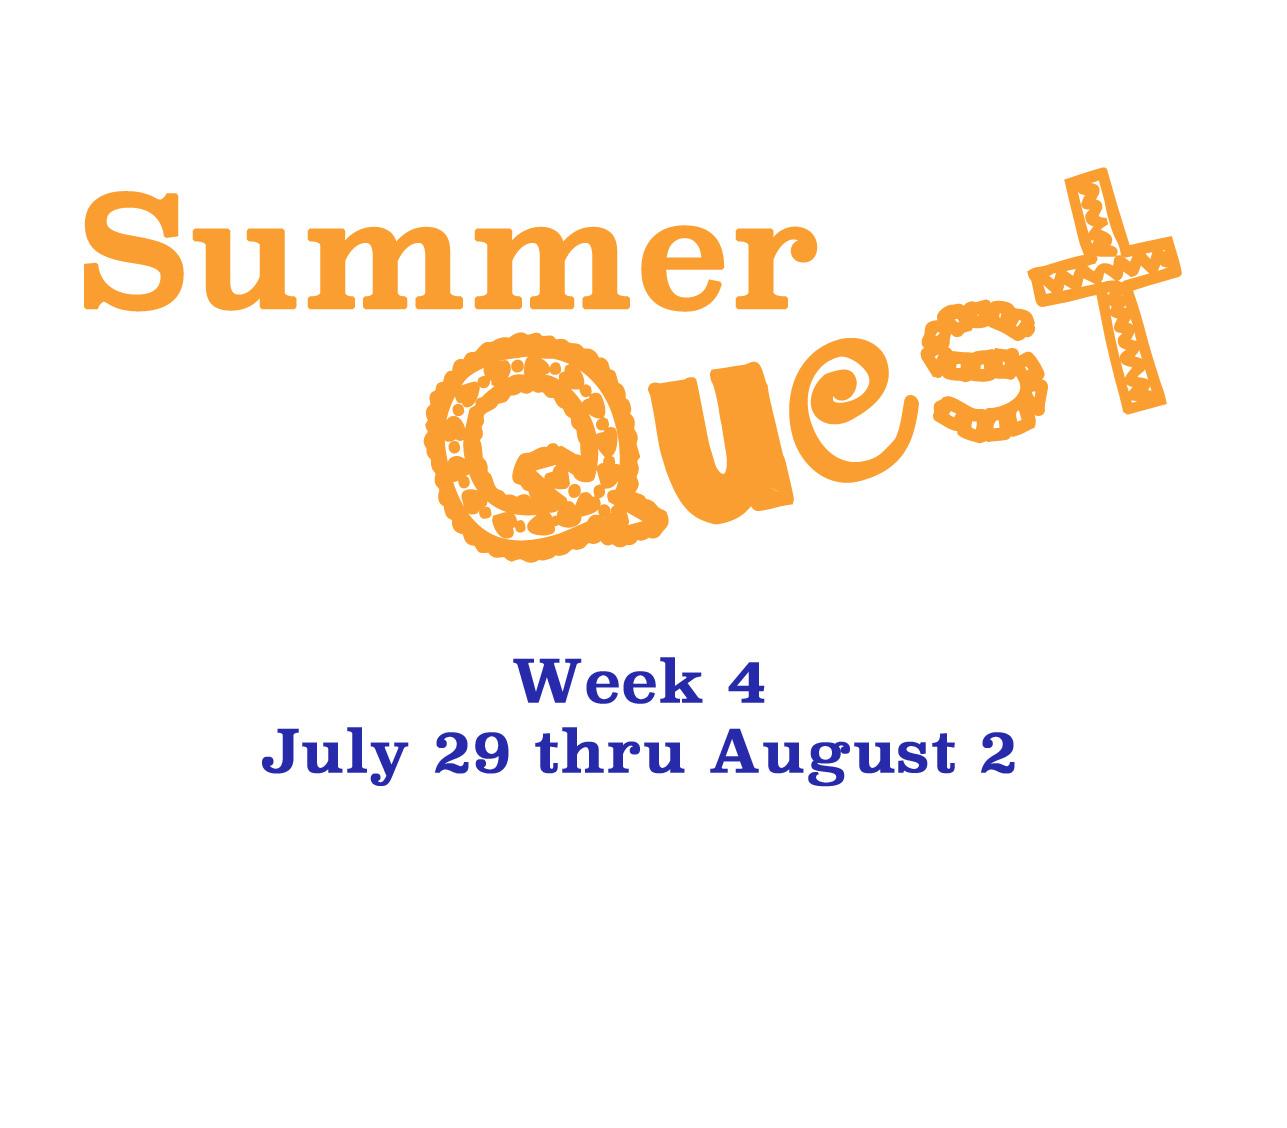 Summer Quest Logo_week 4 2019square.jpg